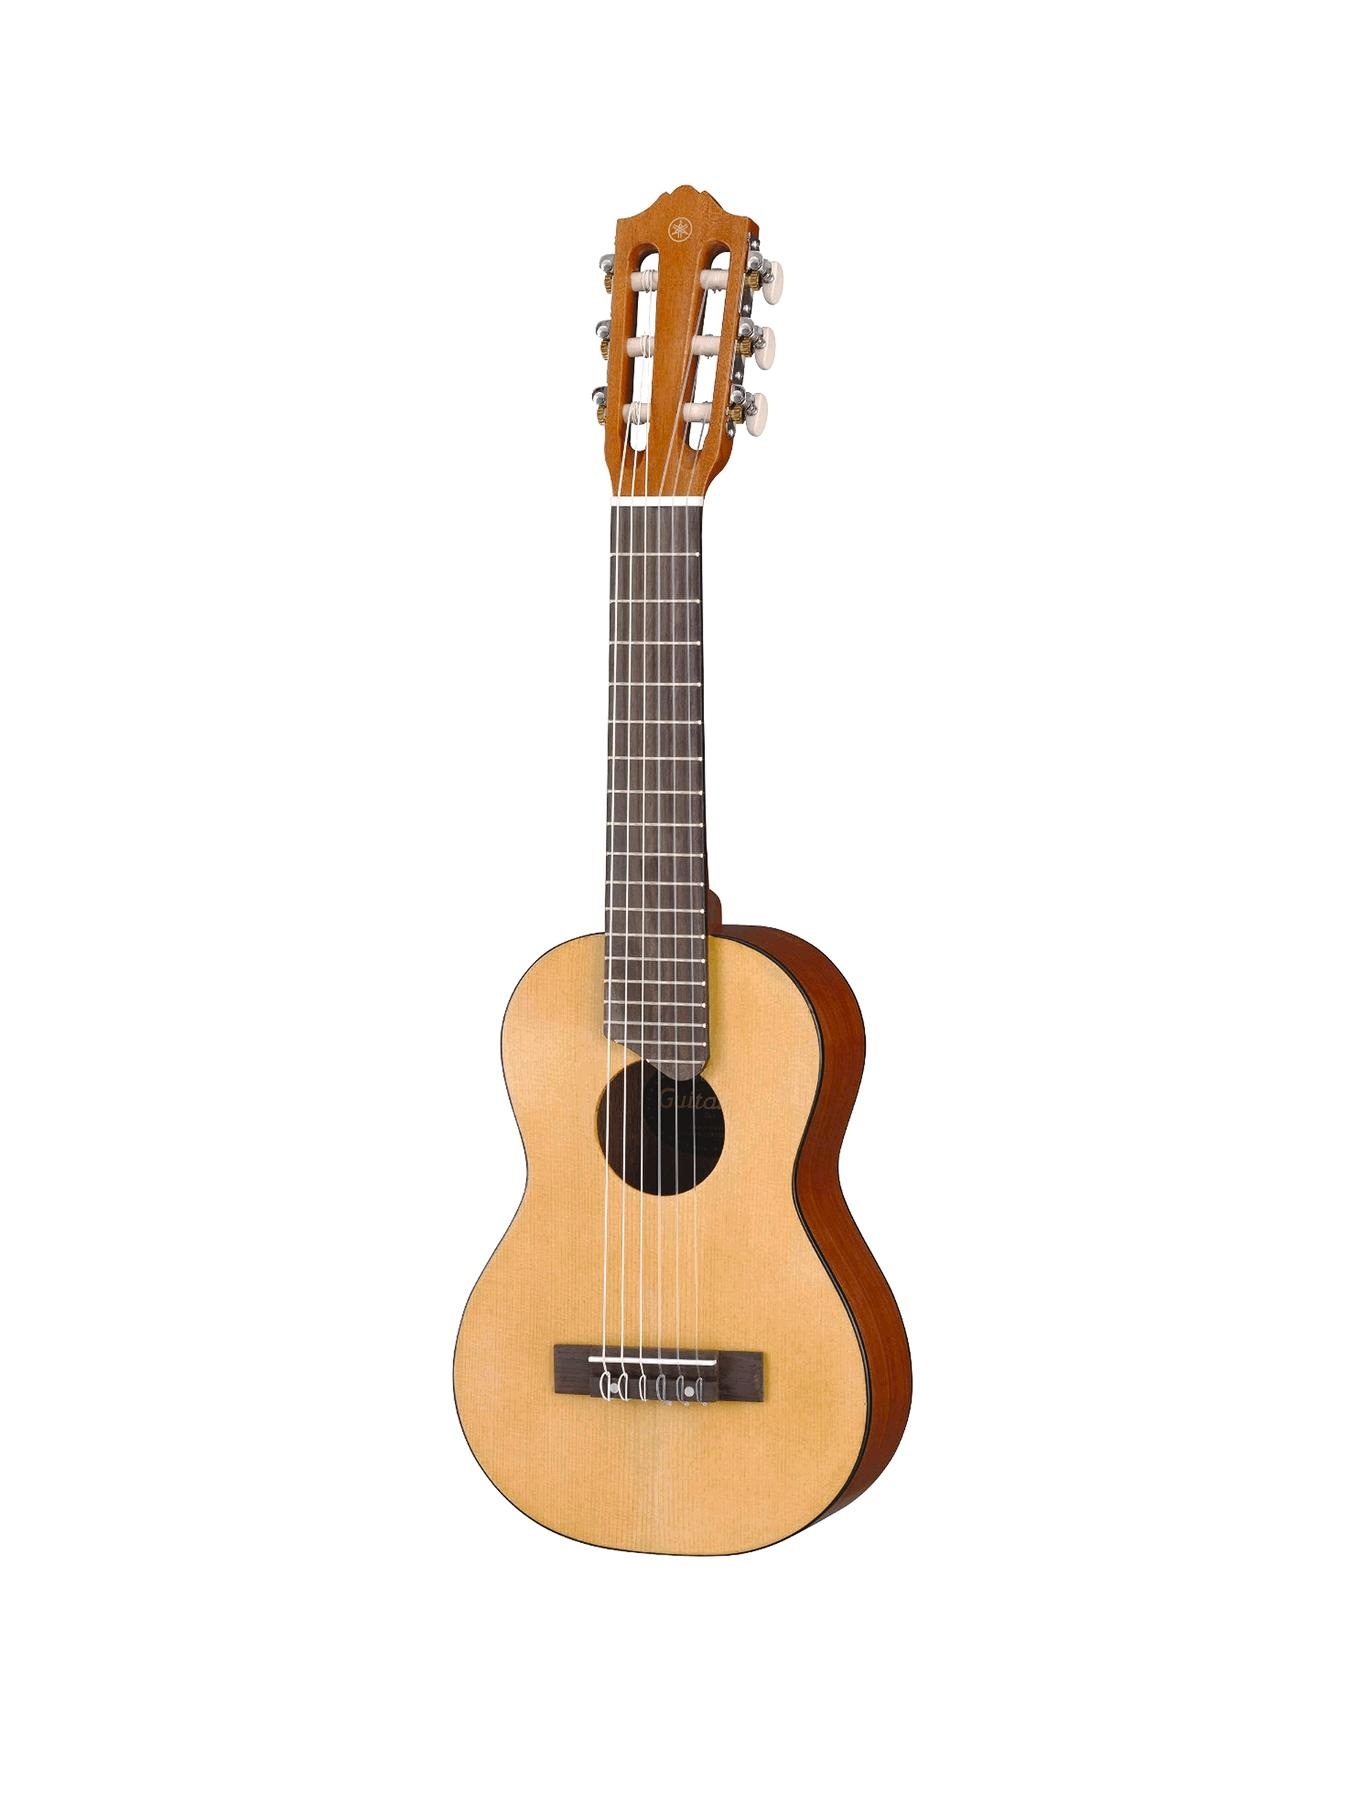 Yamaha GL1 Guitarlele Musical Instrument